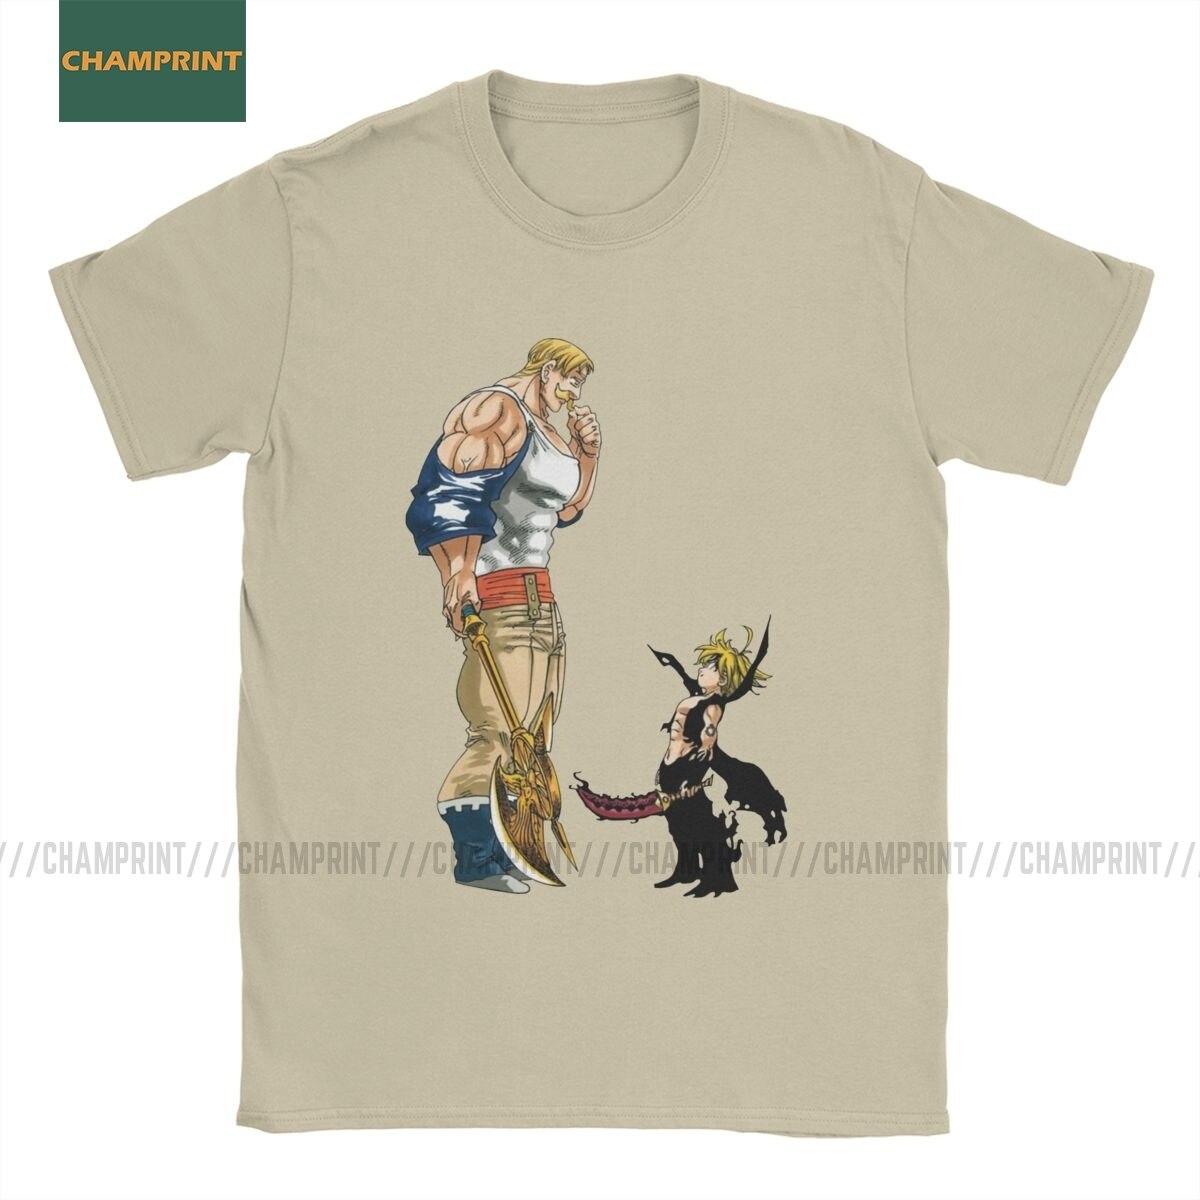 Camiseta canor Vs Meliodas The Seven Deadly Sins para hombre, Camiseta de algodón de manga corta de Anime Nanatsu No Taizai Pig Hawk, camiseta 6XL